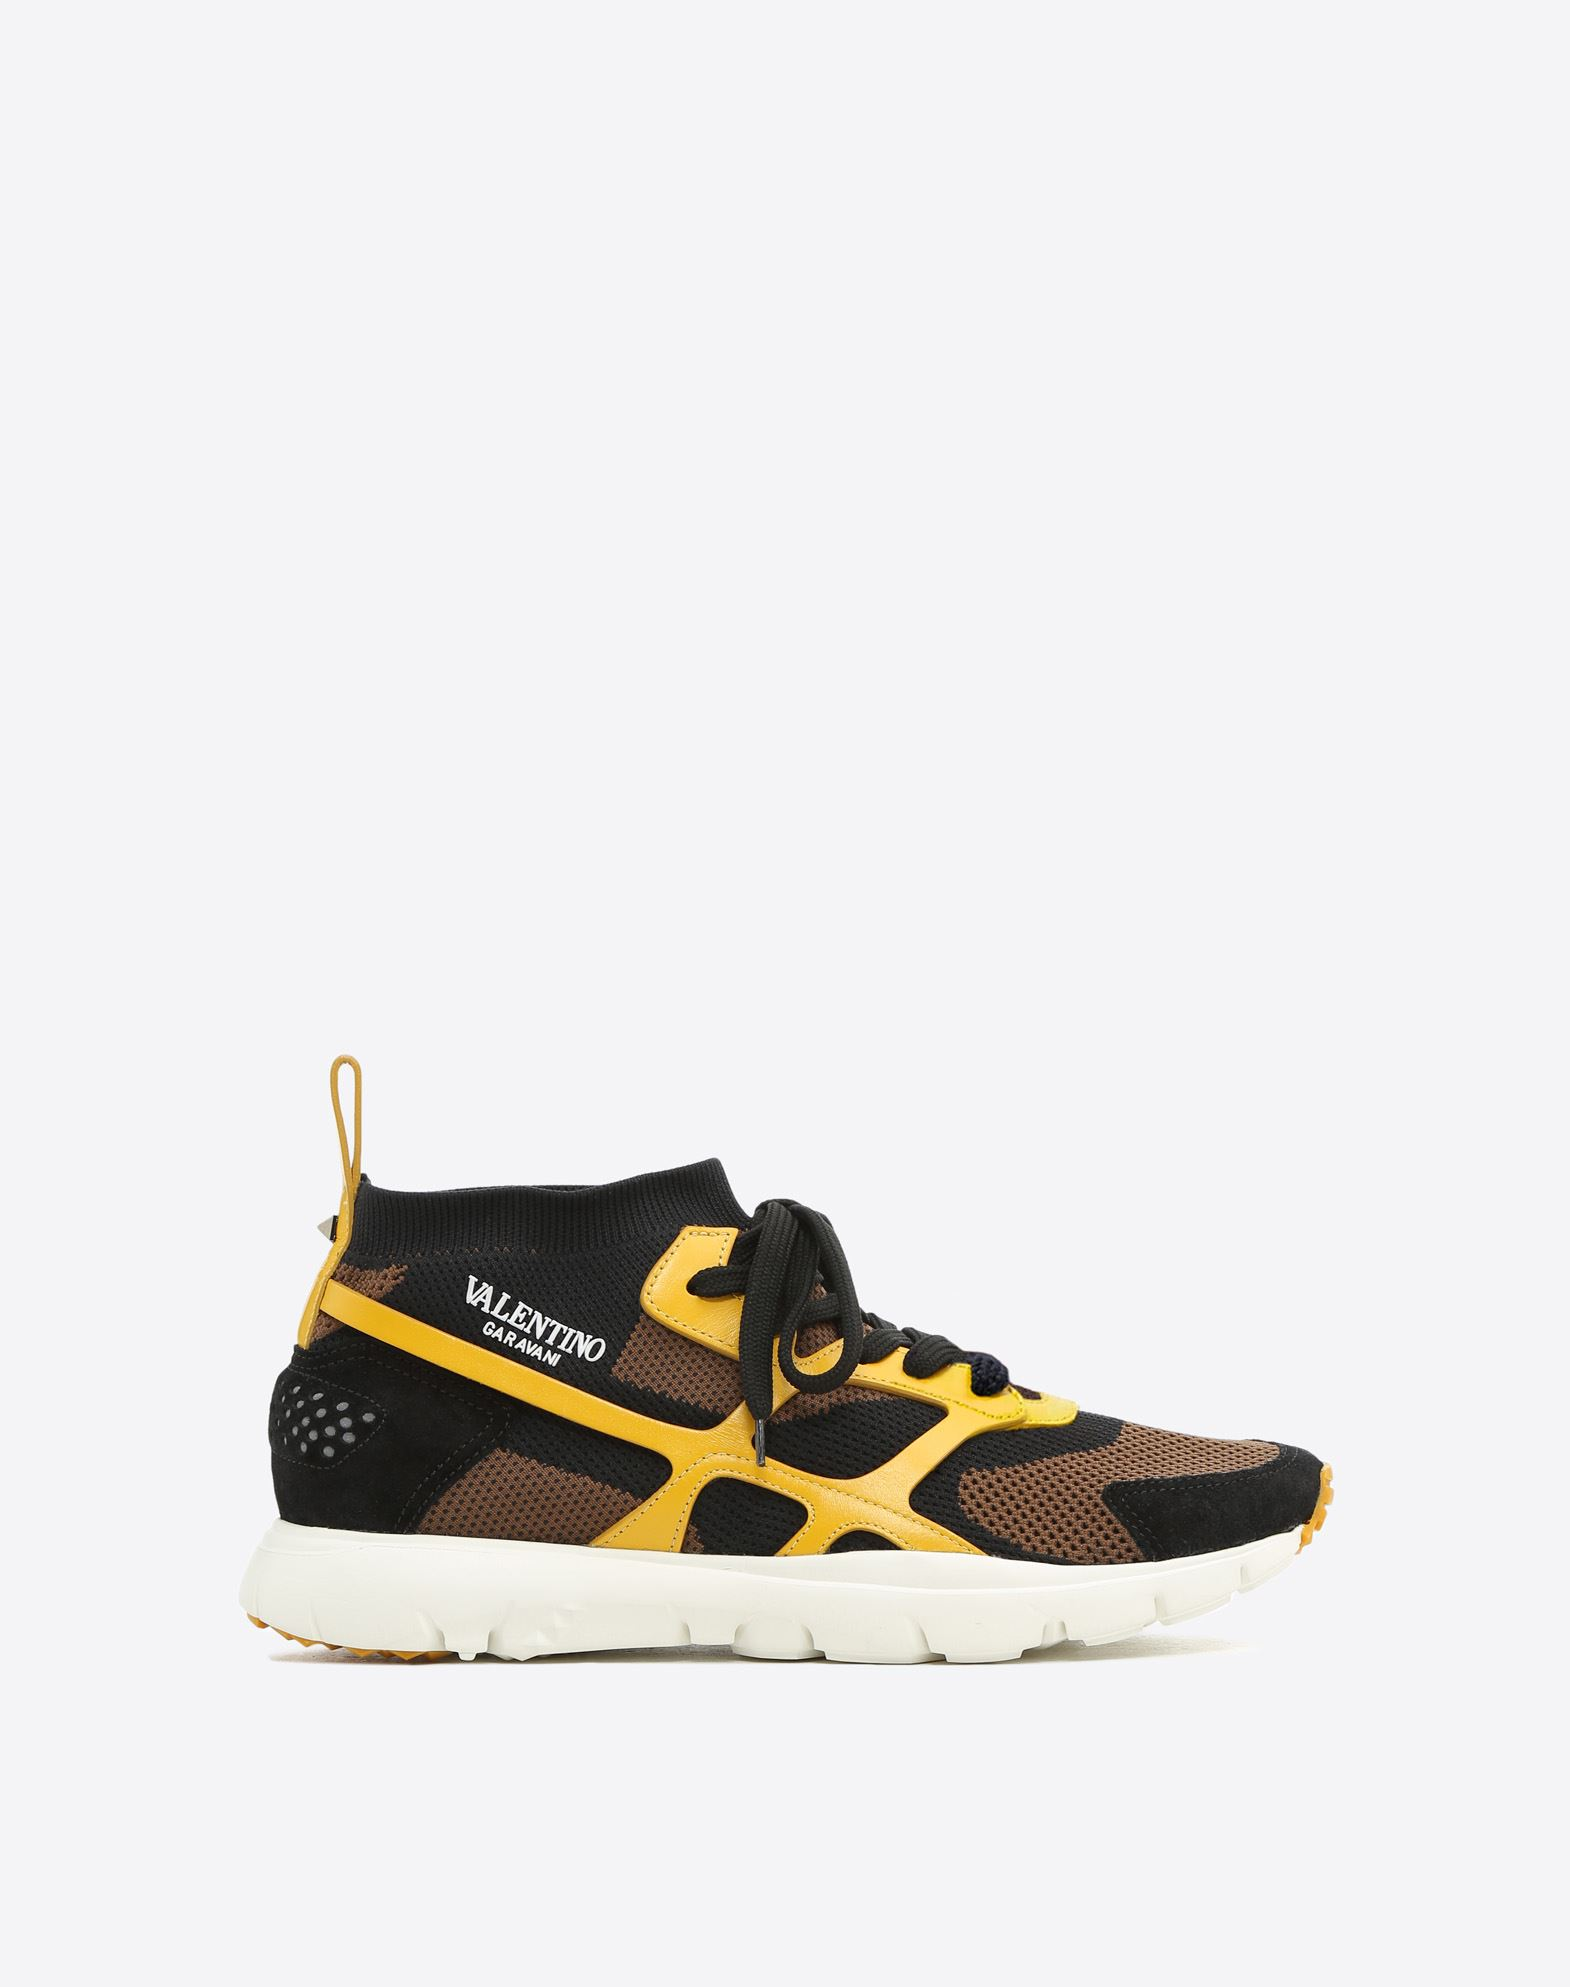 VALENTINO GARAVANI UOMO Sneakers Sound High SNEAKERS ALTAS U f